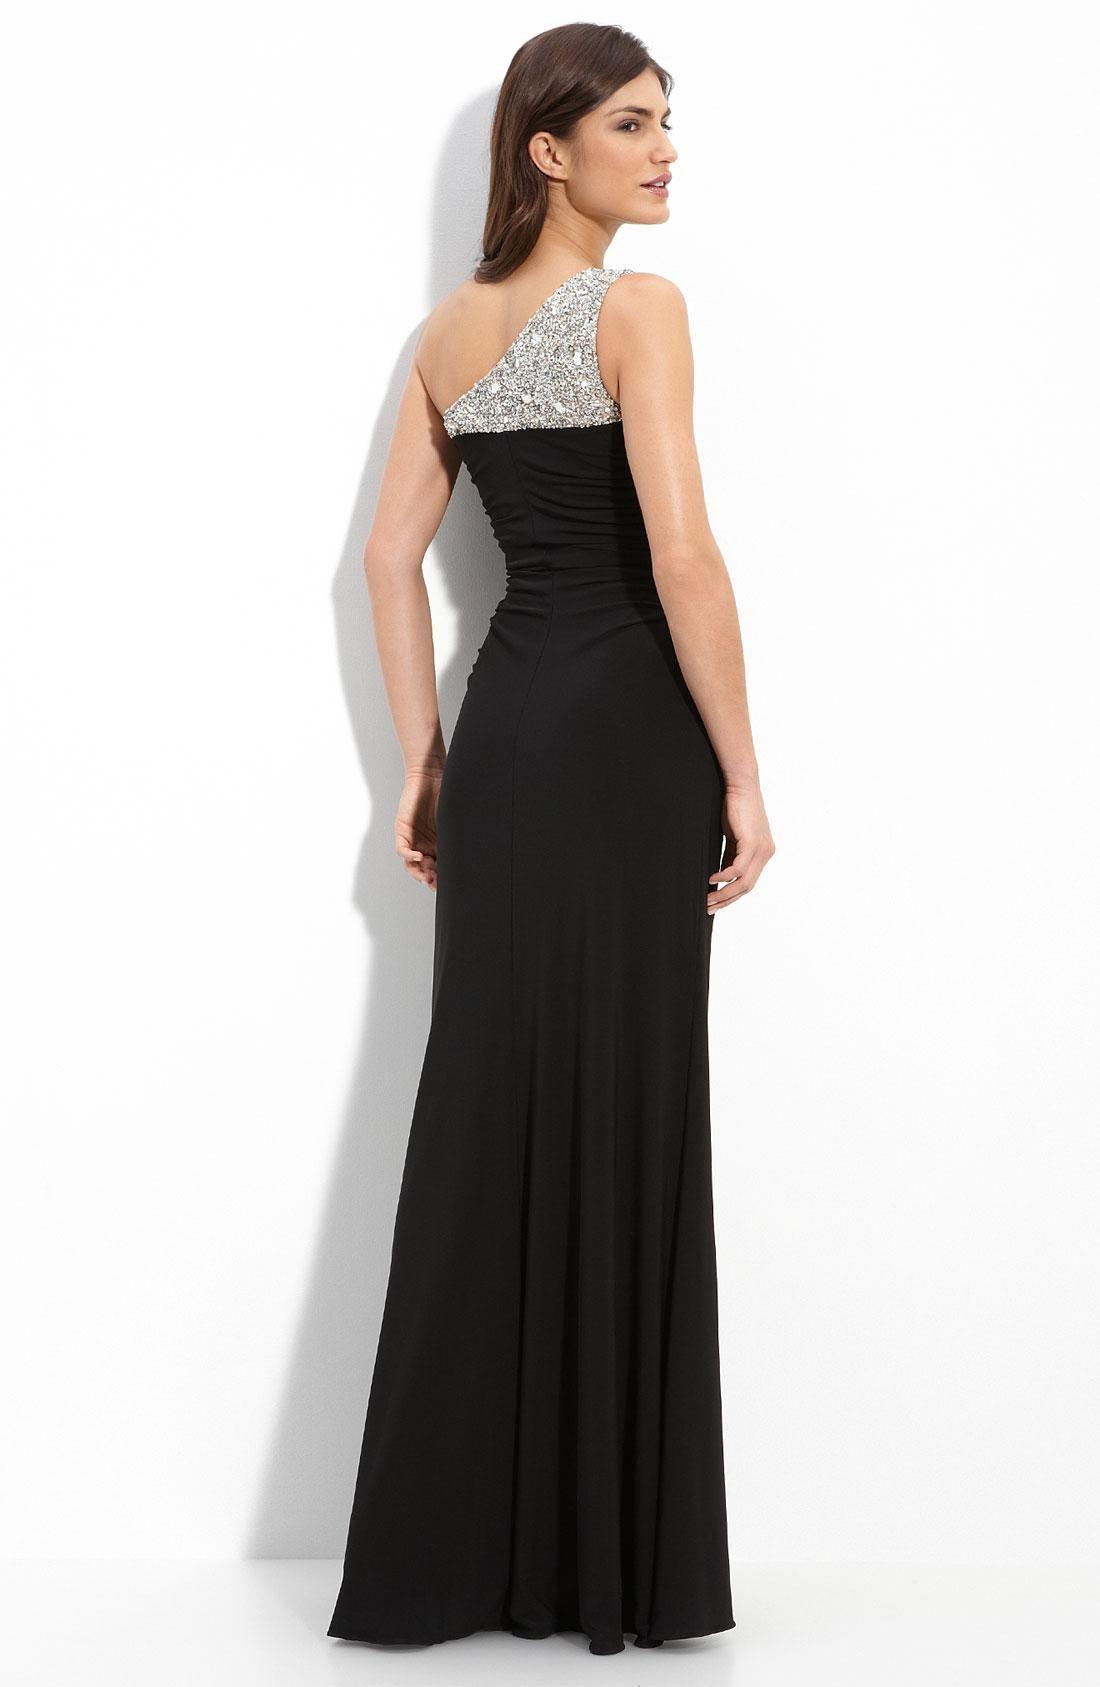 Long Black Dress For Wedding Party Plus Size Dresses For Wedding Guest Check More At H Long Black Evening Dress Black Evening Dresses Black Long Evening Gown [ 1687 x 1100 Pixel ]